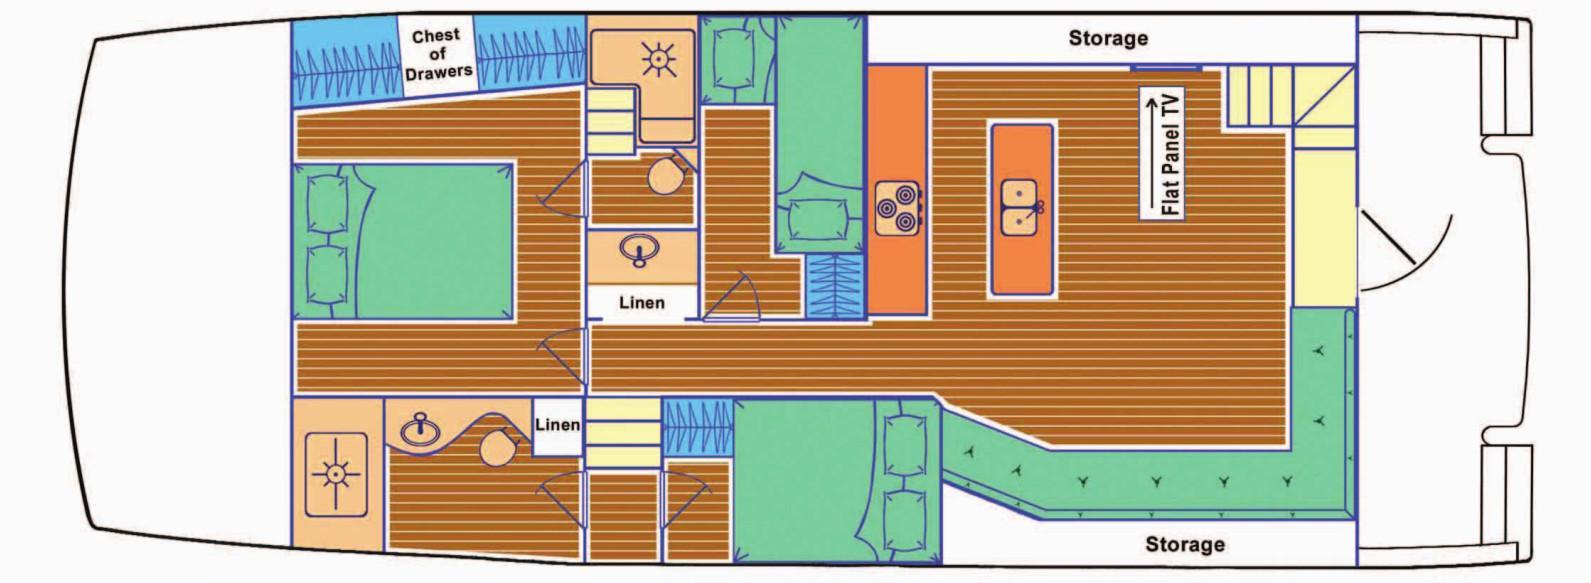 Main Deck Layout